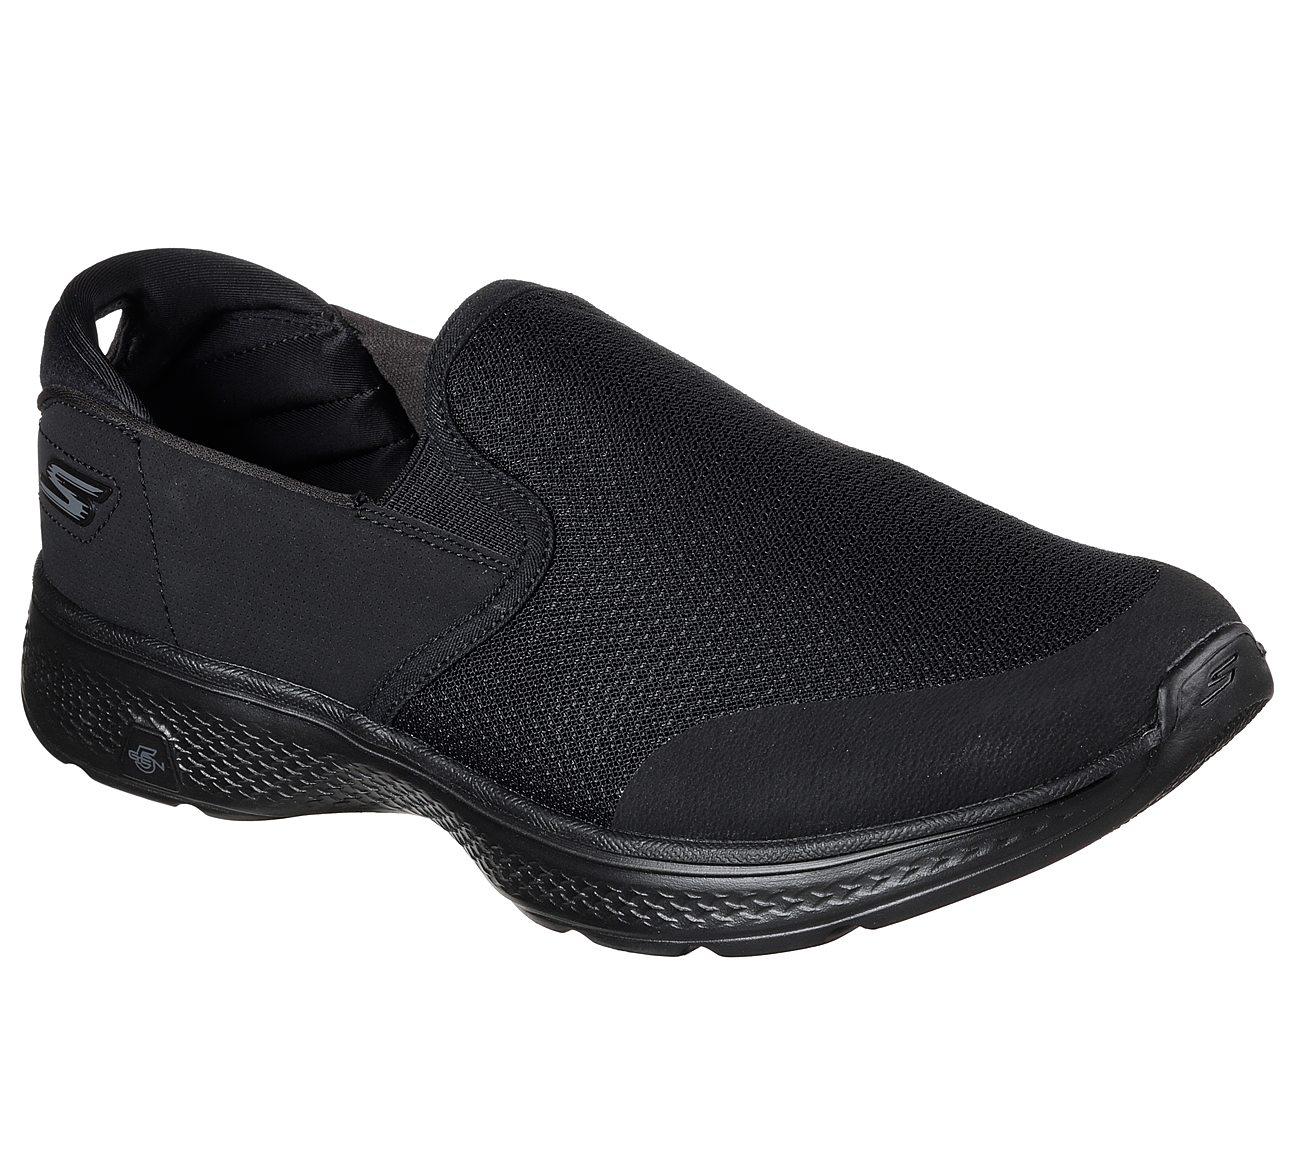 Skechers GOwalk 4 - Contain